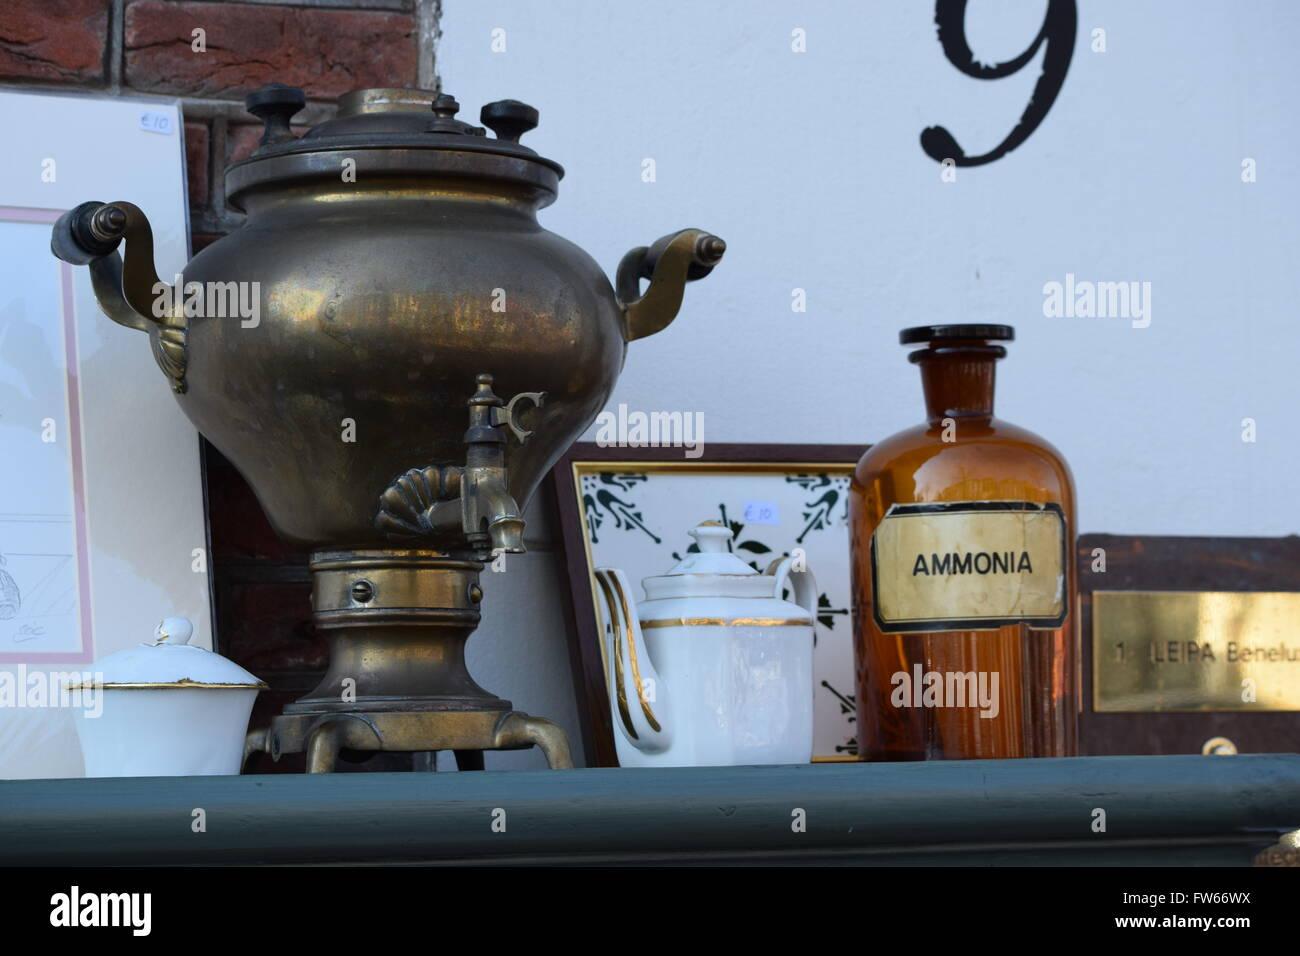 Russian Samovar. Flea Market. - Stock Image